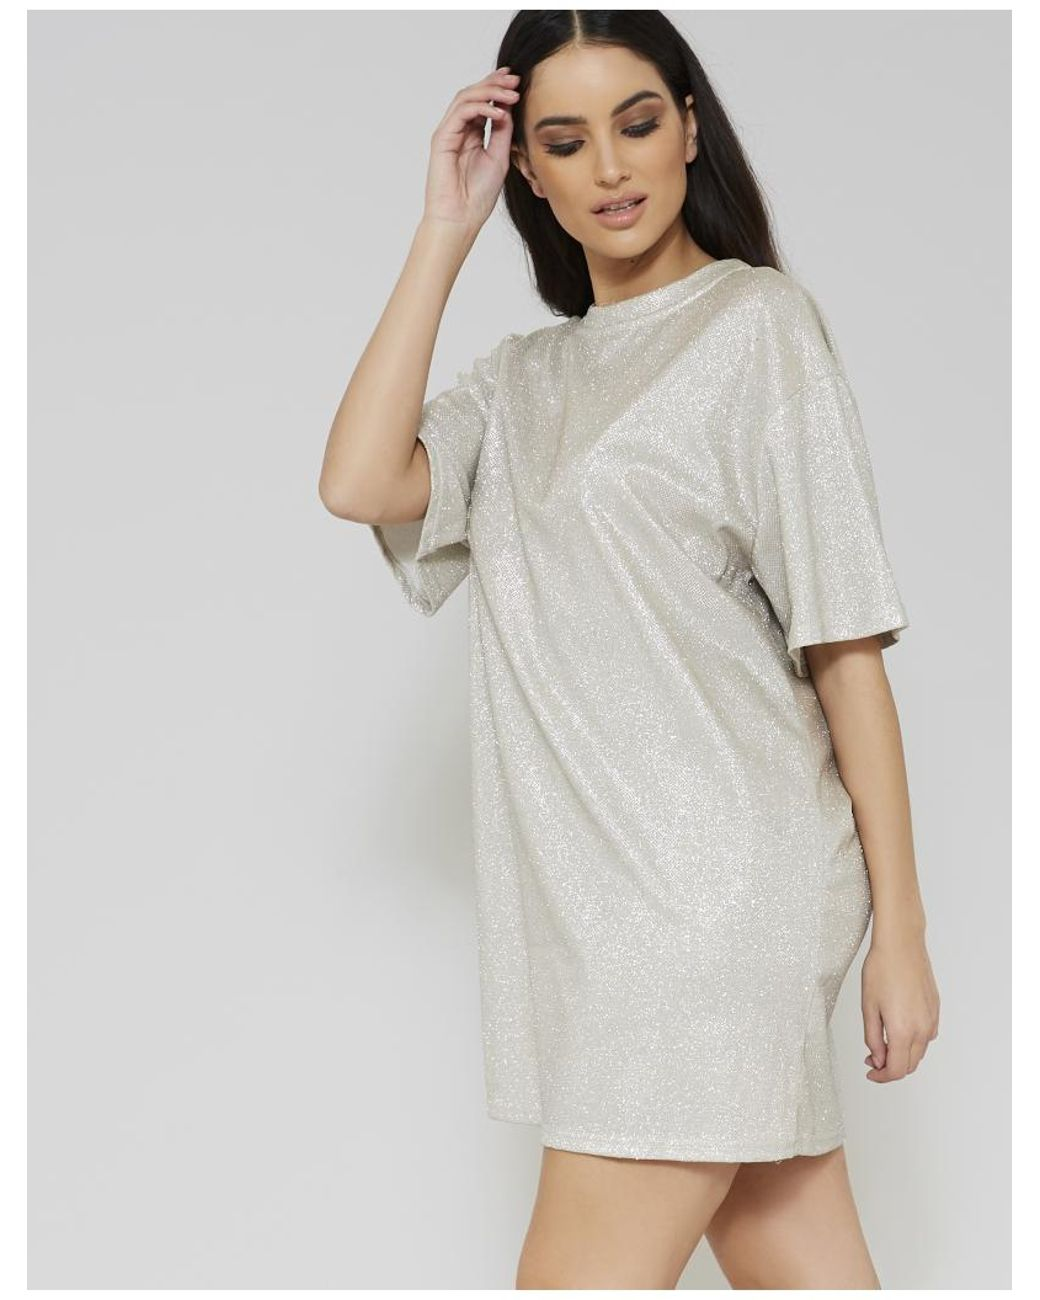 e50711856e5 Lyst - Public Desire Silver Glitter Oversized T-shirt Dress in Metallic